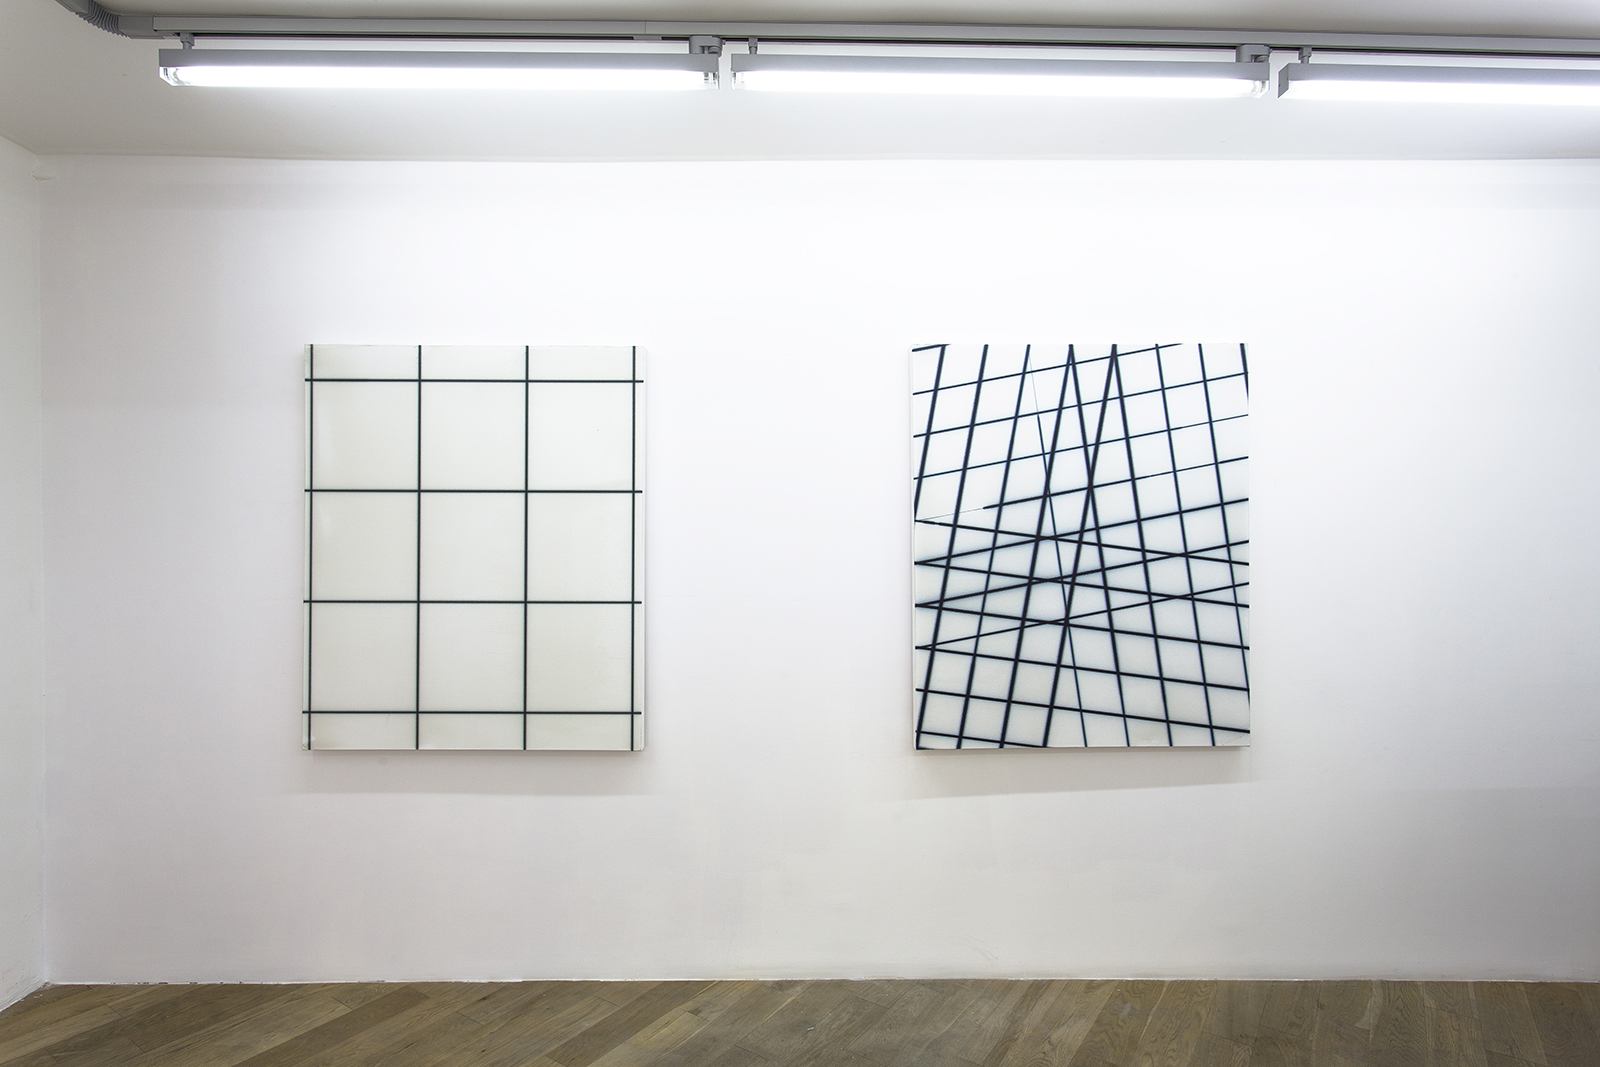 Tendency to movement, Thomas Baumann, exhibition view, June 2015